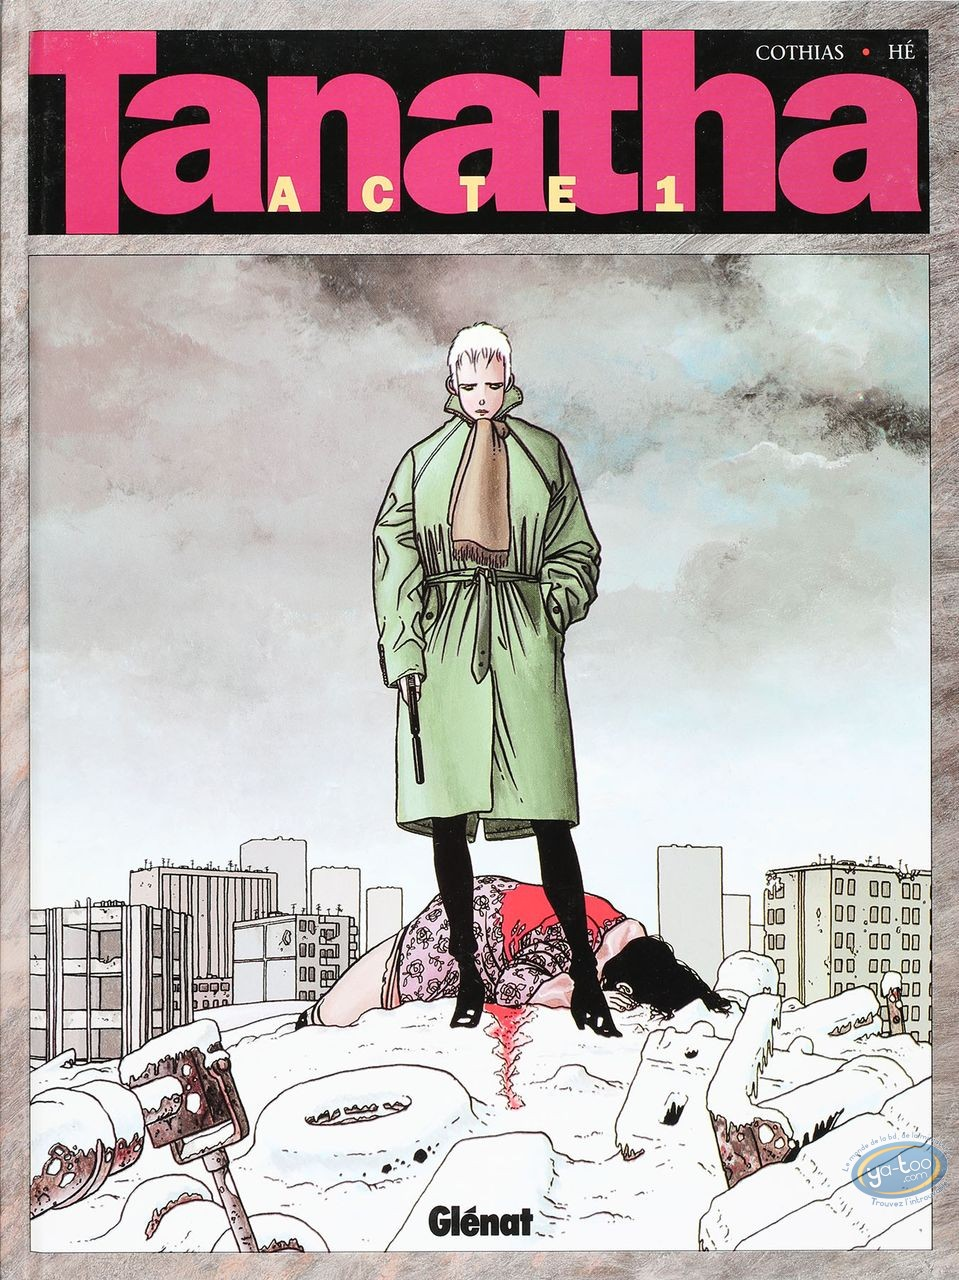 Listed European Comic Books, Tanatha : Acte 1 (good condition)